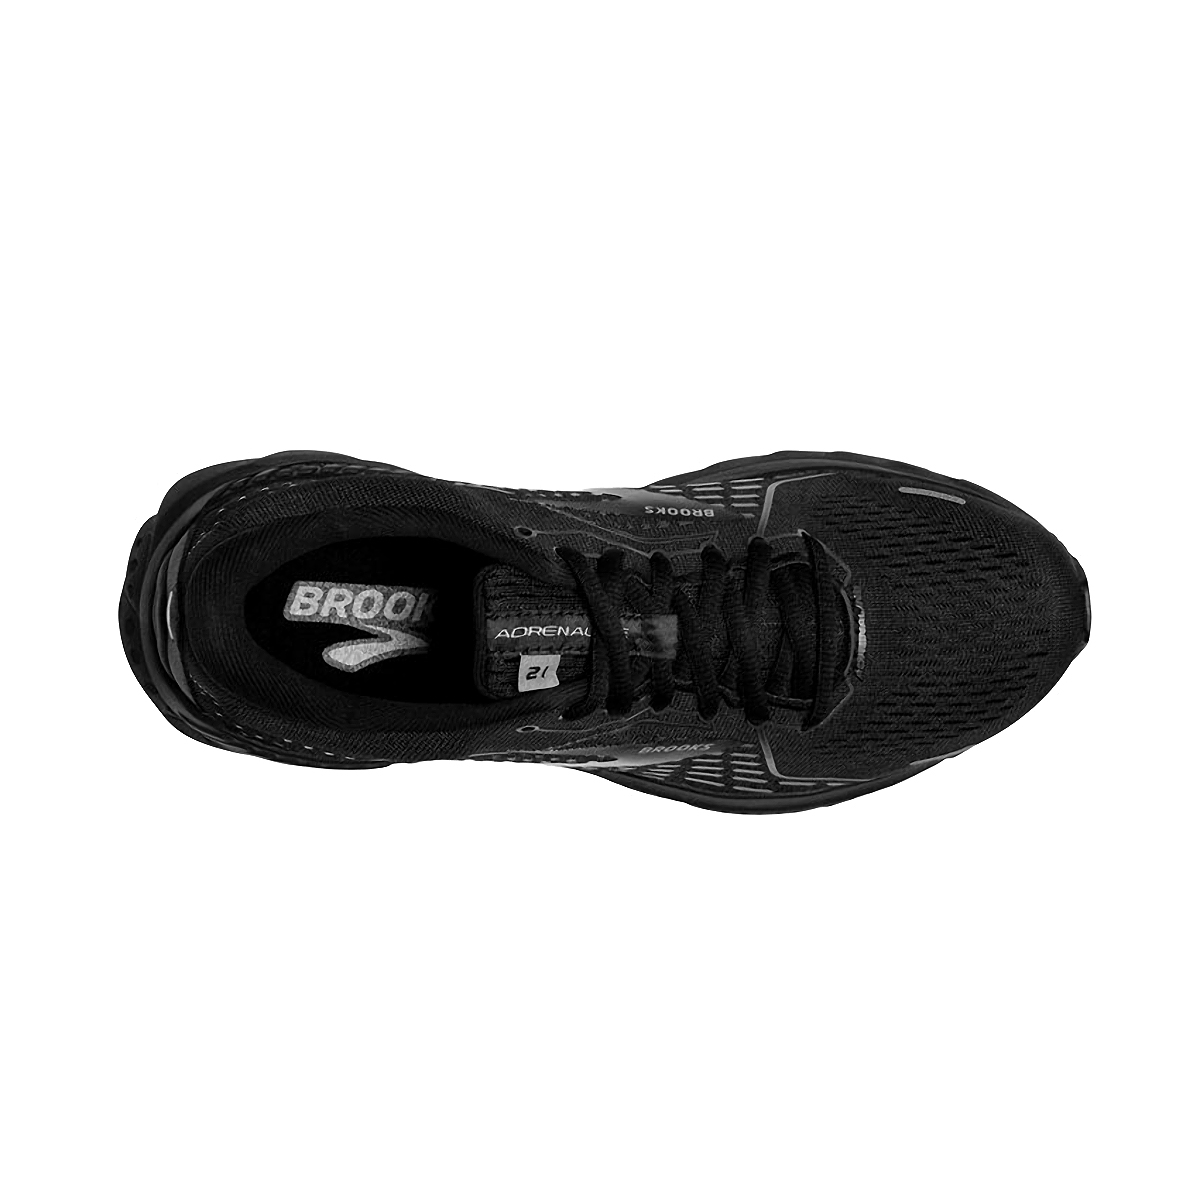 Women's Brooks Adrenaline GTS 21 Running Shoe - Color: Black/Black/Ebony - Size: 5 - Width: Regular, Black/Black/Ebony, large, image 4